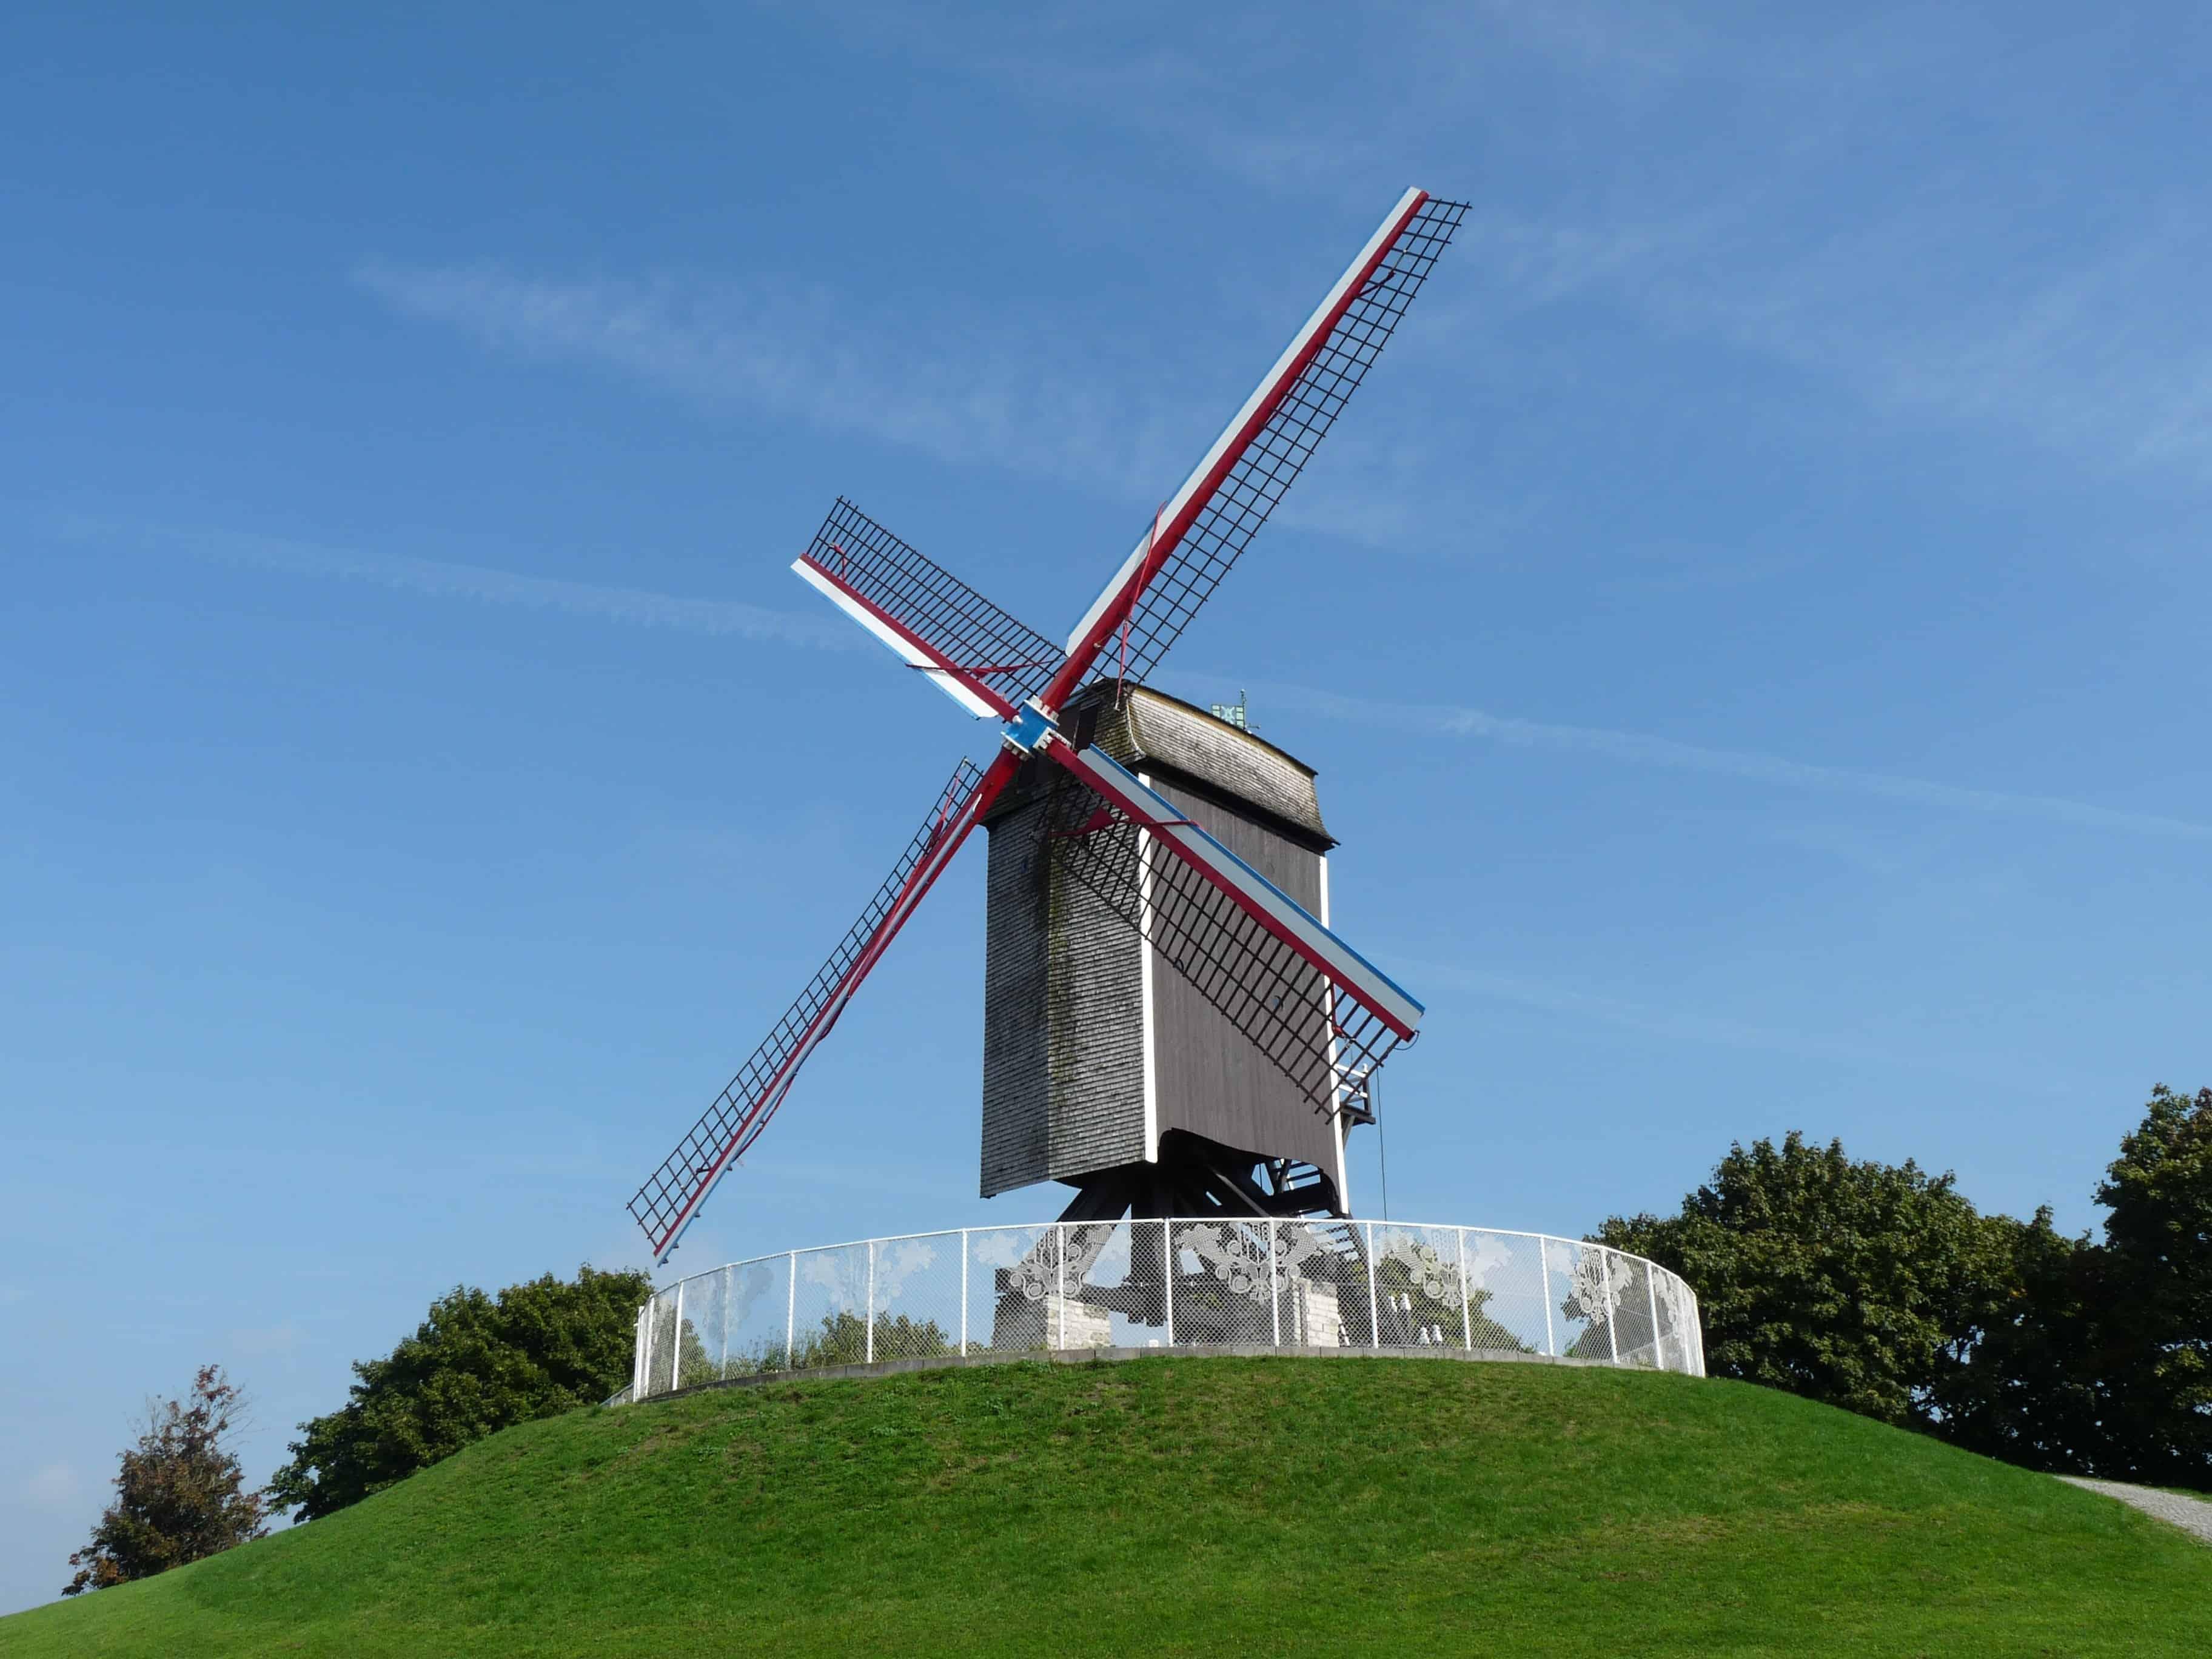 Molino Sint Janshuis